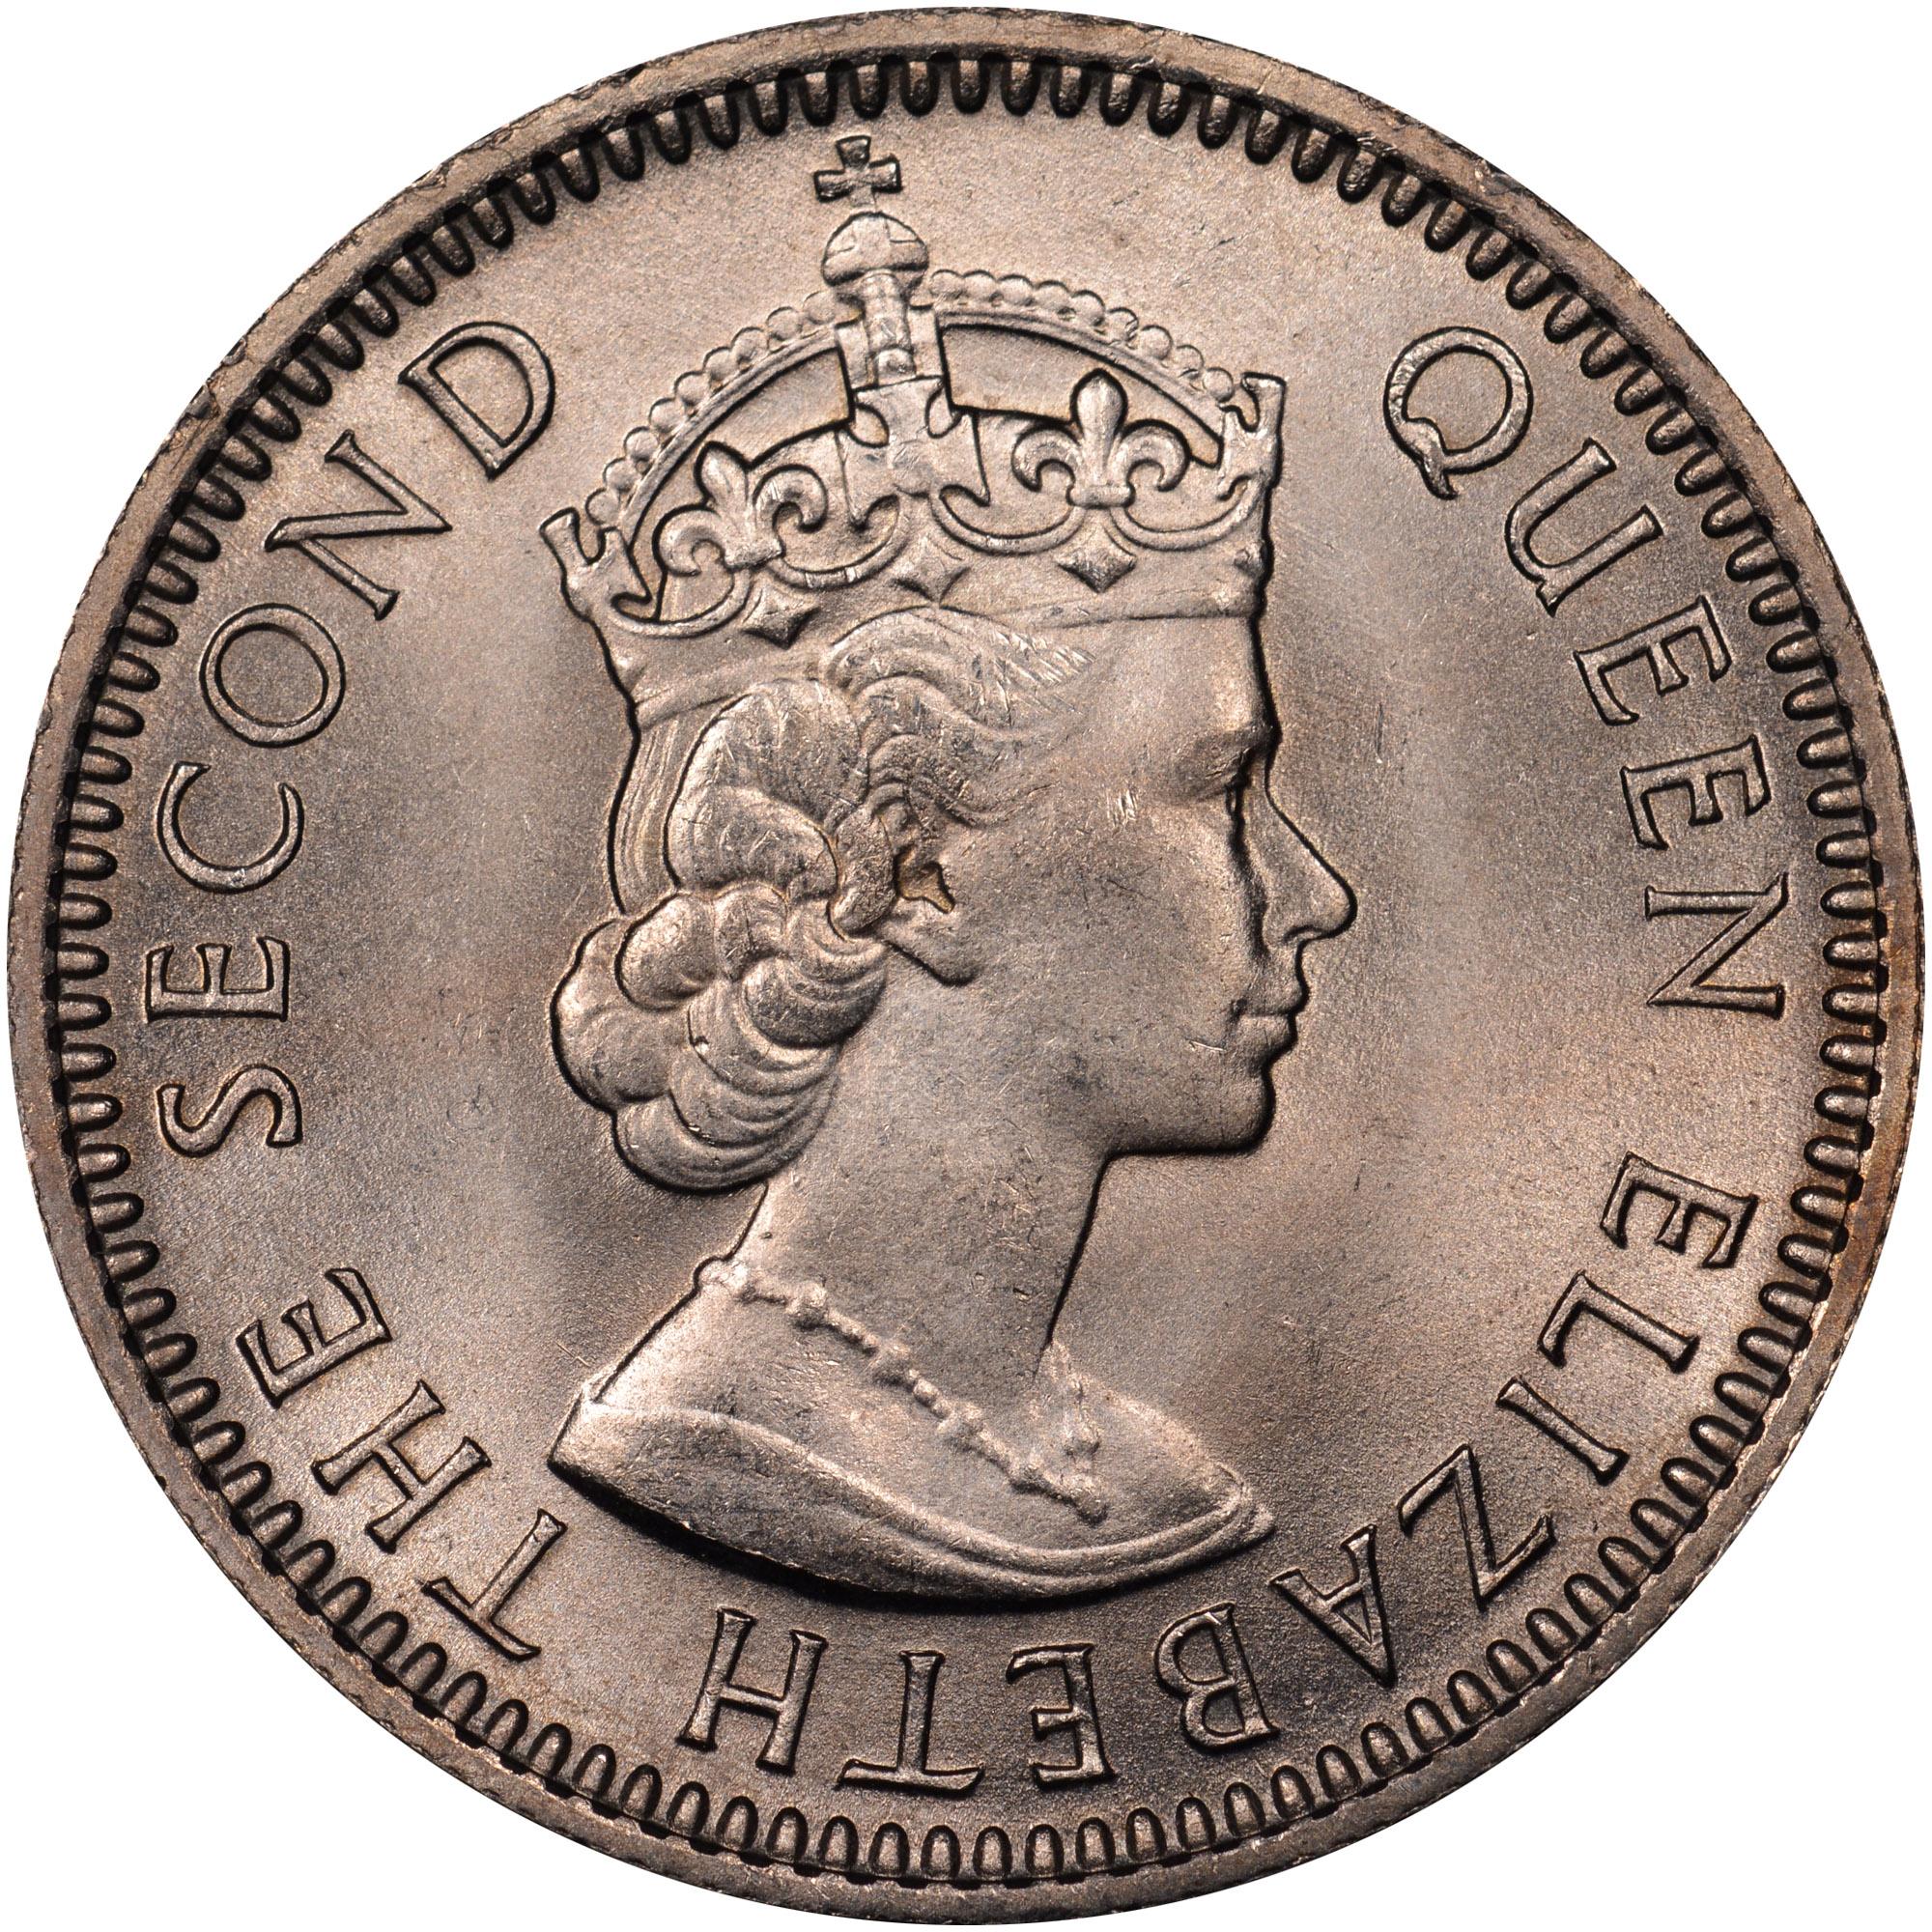 Malaya & British Borneo 10 Cents KM 2 Prices & Values | NGC